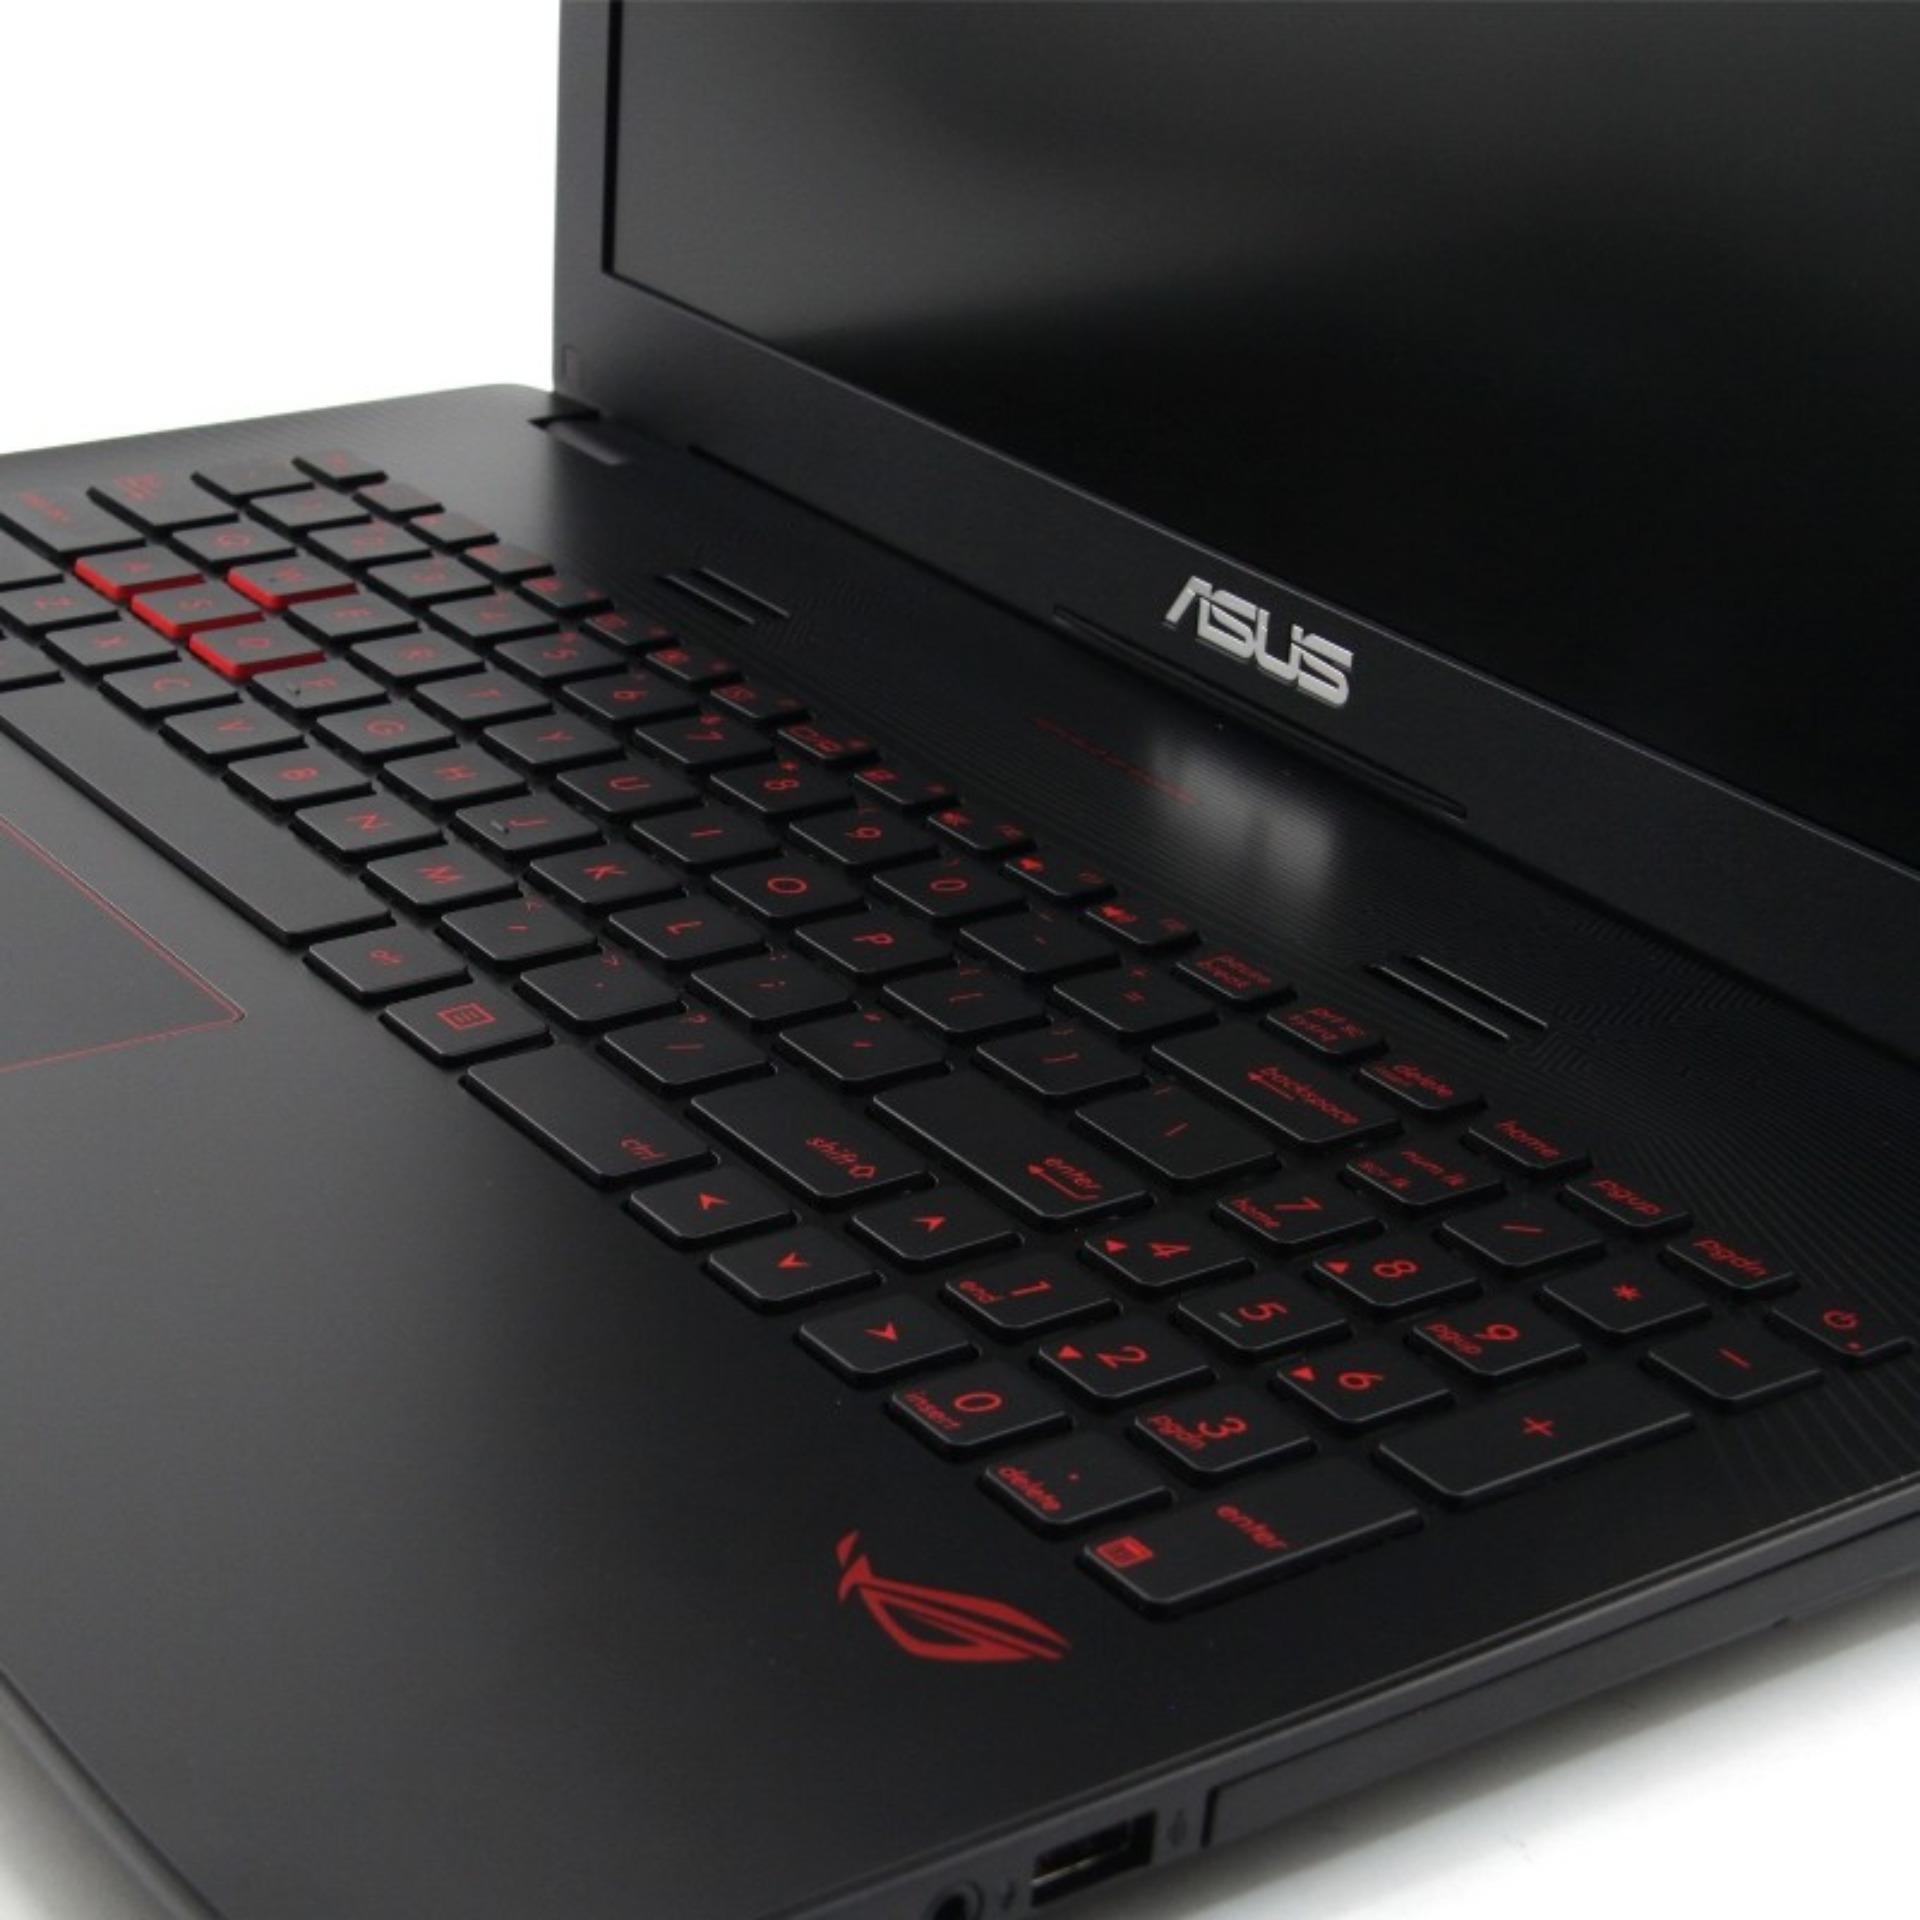 Asus Rog Gl 552x Kbl Dm409t Laptop Gaming Terbaik Plus Back Pack Gl552vx Intel Core I7 7700hq 12gb Ram 1tb Hdd Geforce Gtx950m 4gb Win10 156 Inc Kabylake